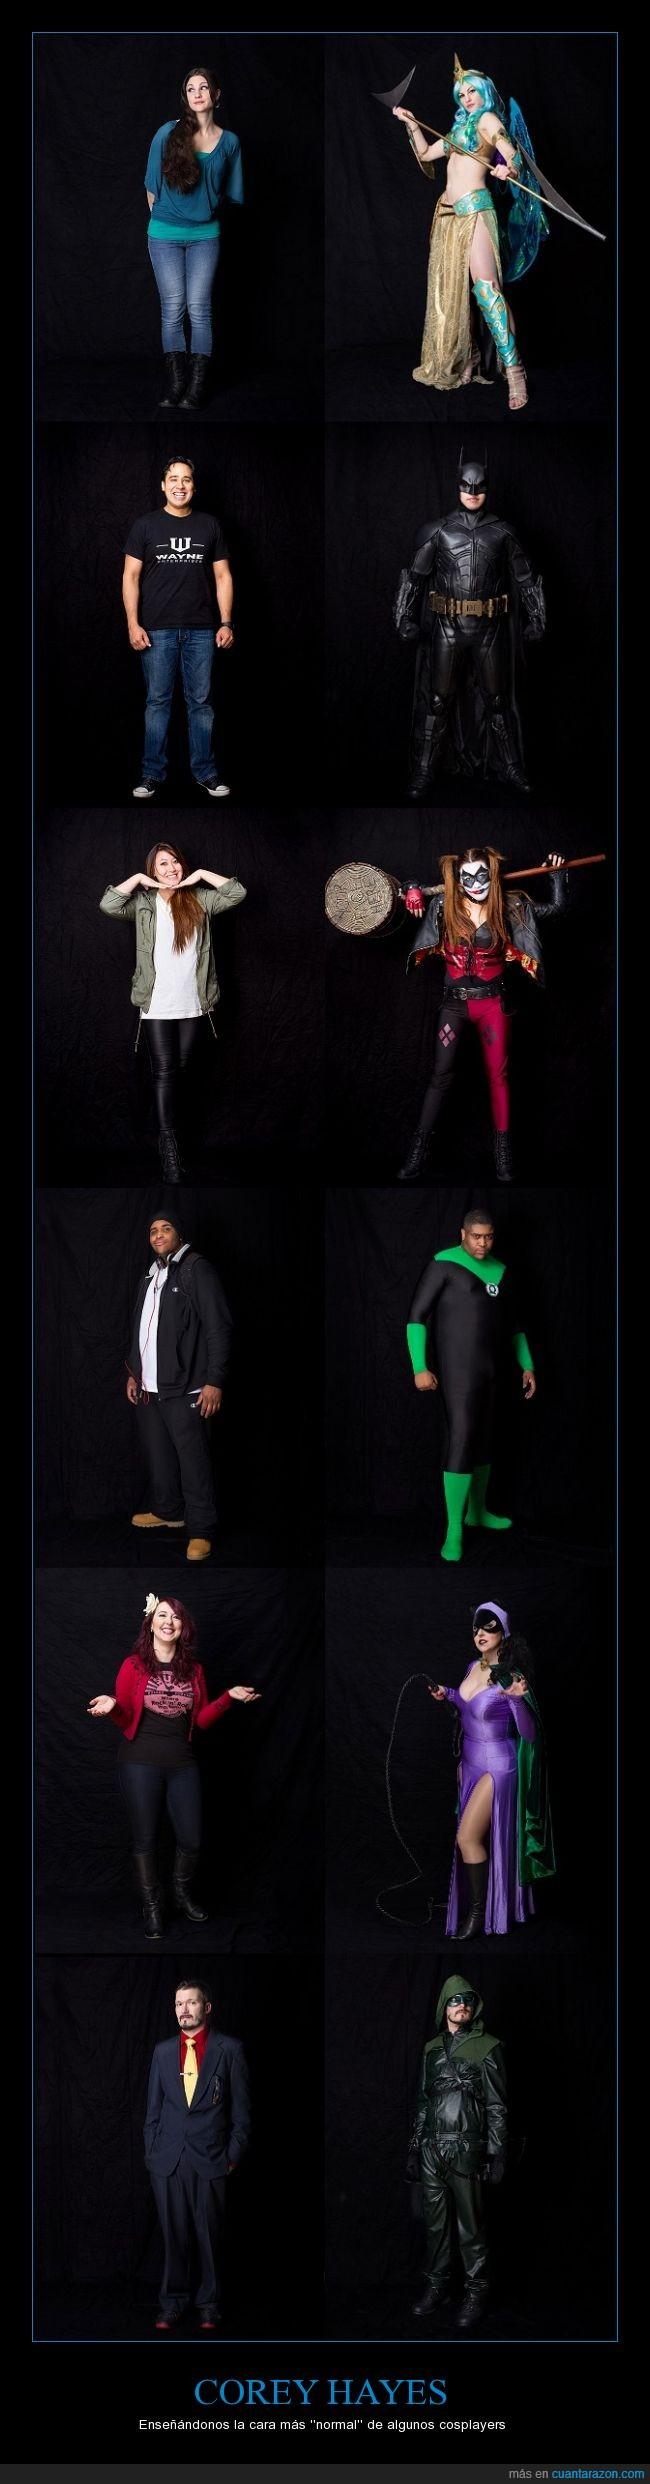 batgirl,batman,Corey Hayes,cosplay,cosplayer,disfraz,disfrazado,Green Arrow,Harley Quinn